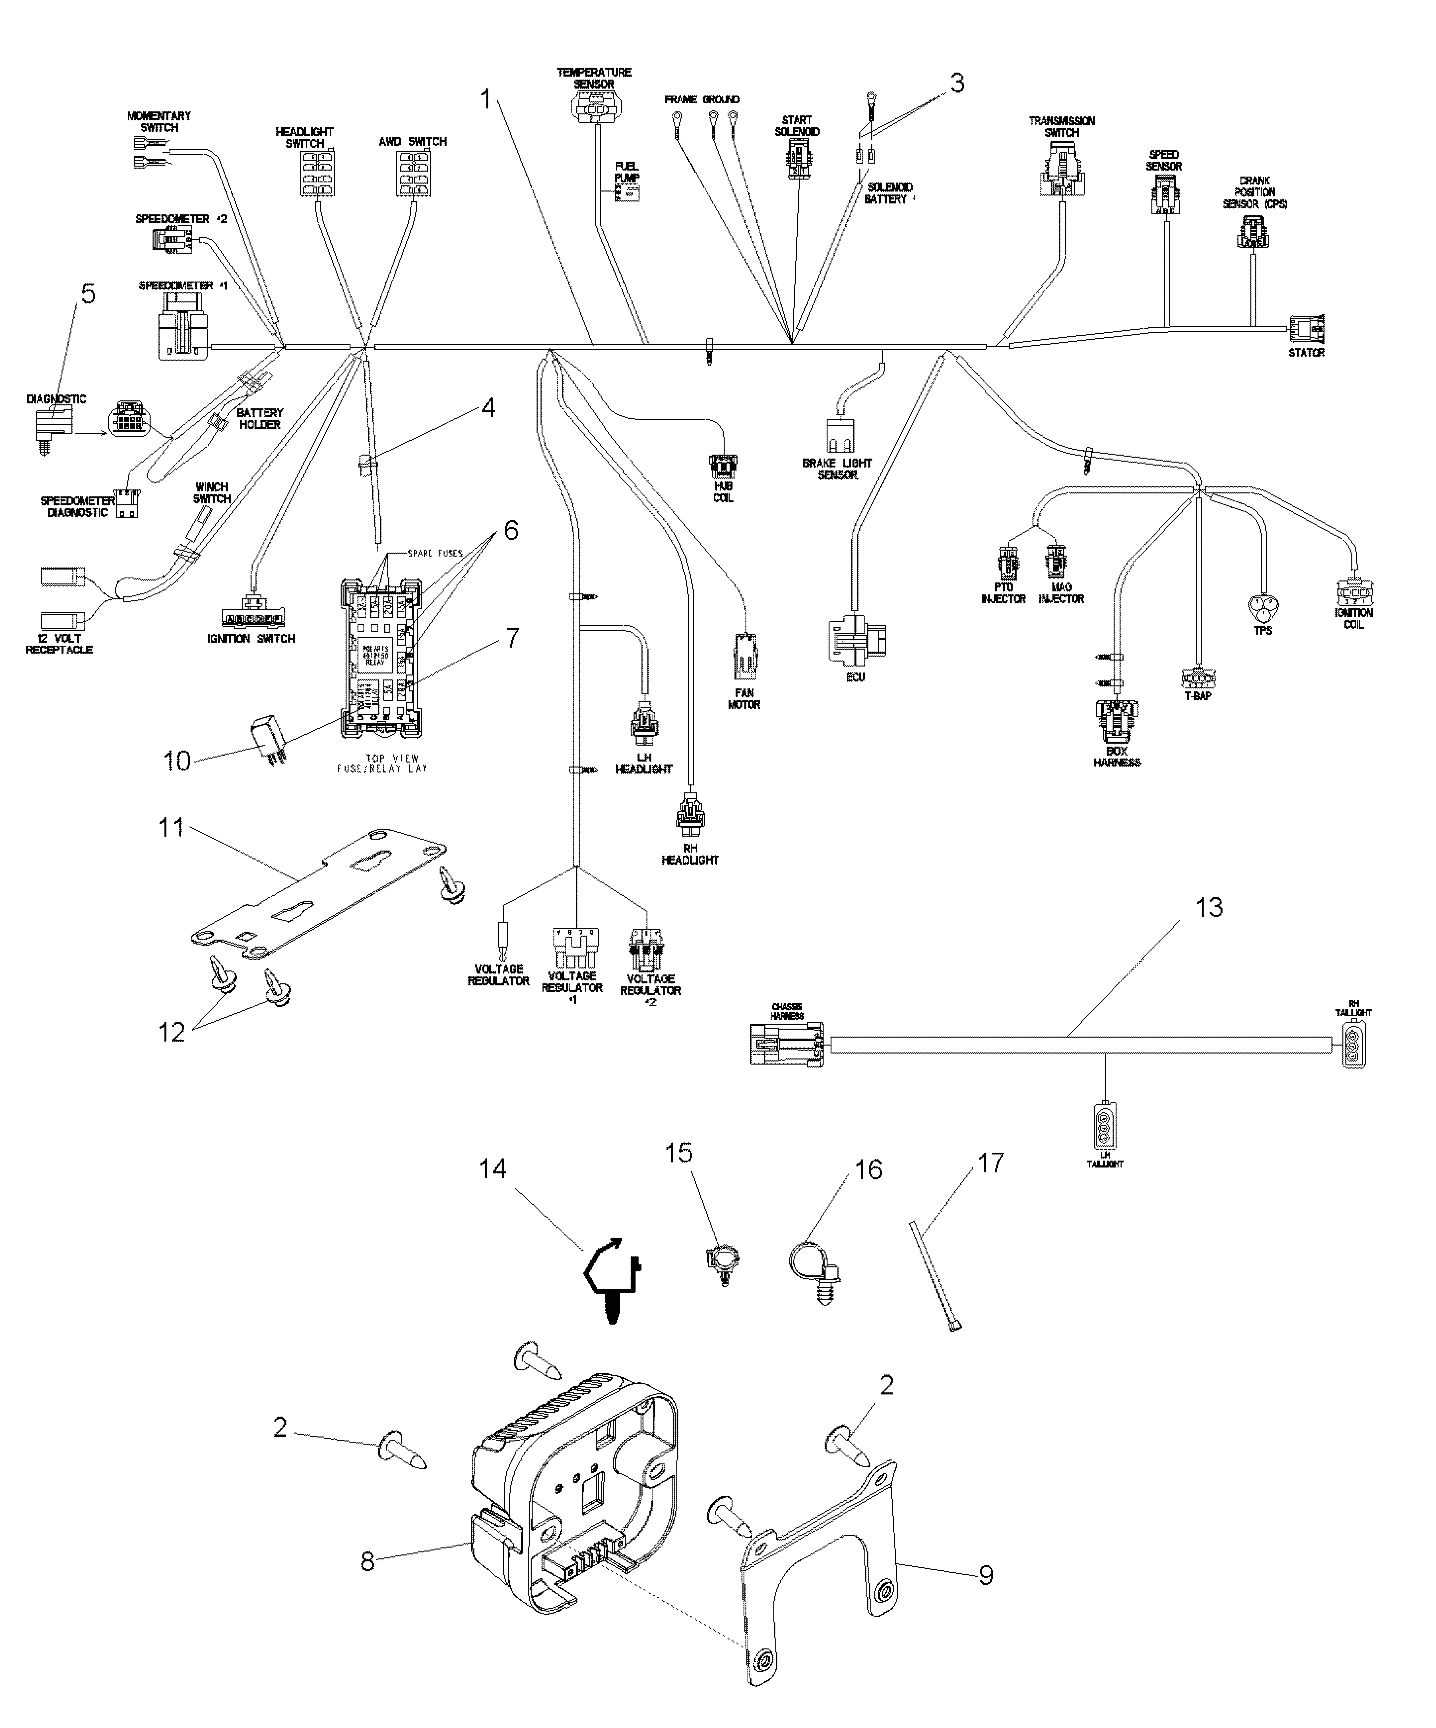 fuse diagram 2008 polaris rzr wiring diagram name 2008 polaris rzr fuse box